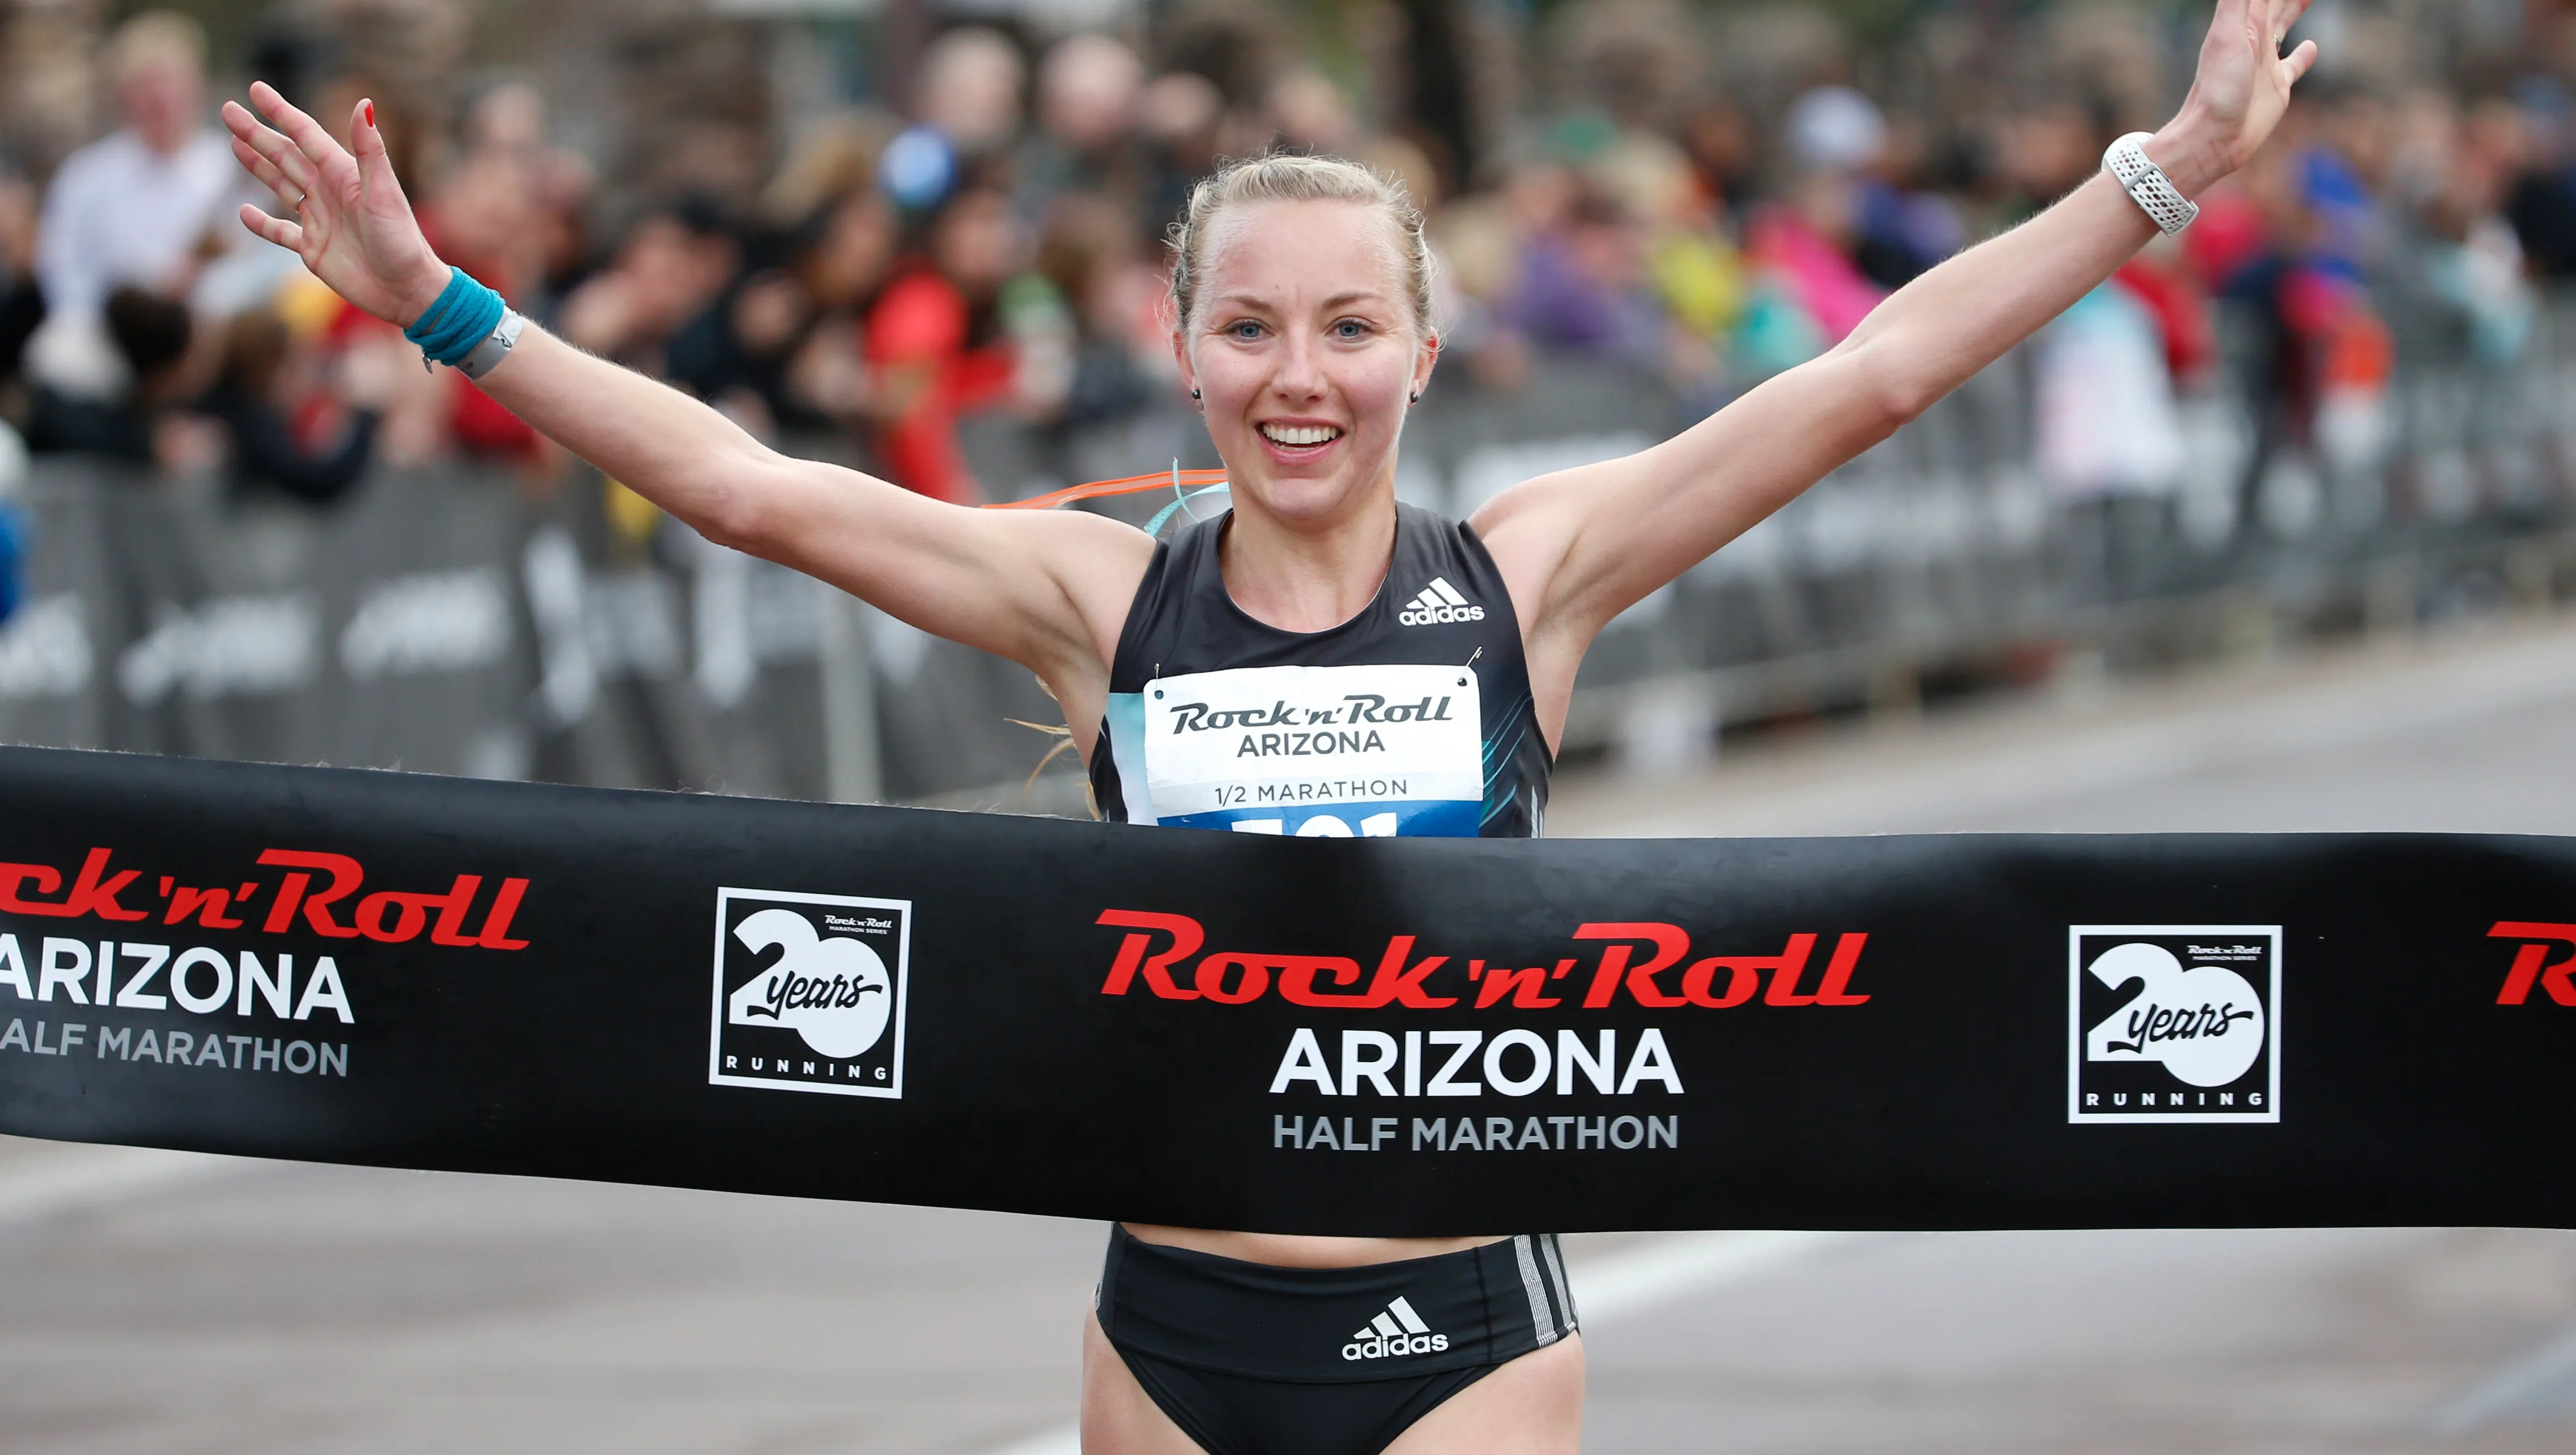 Results Rock n Roll Arizona 12 Marathon womens event